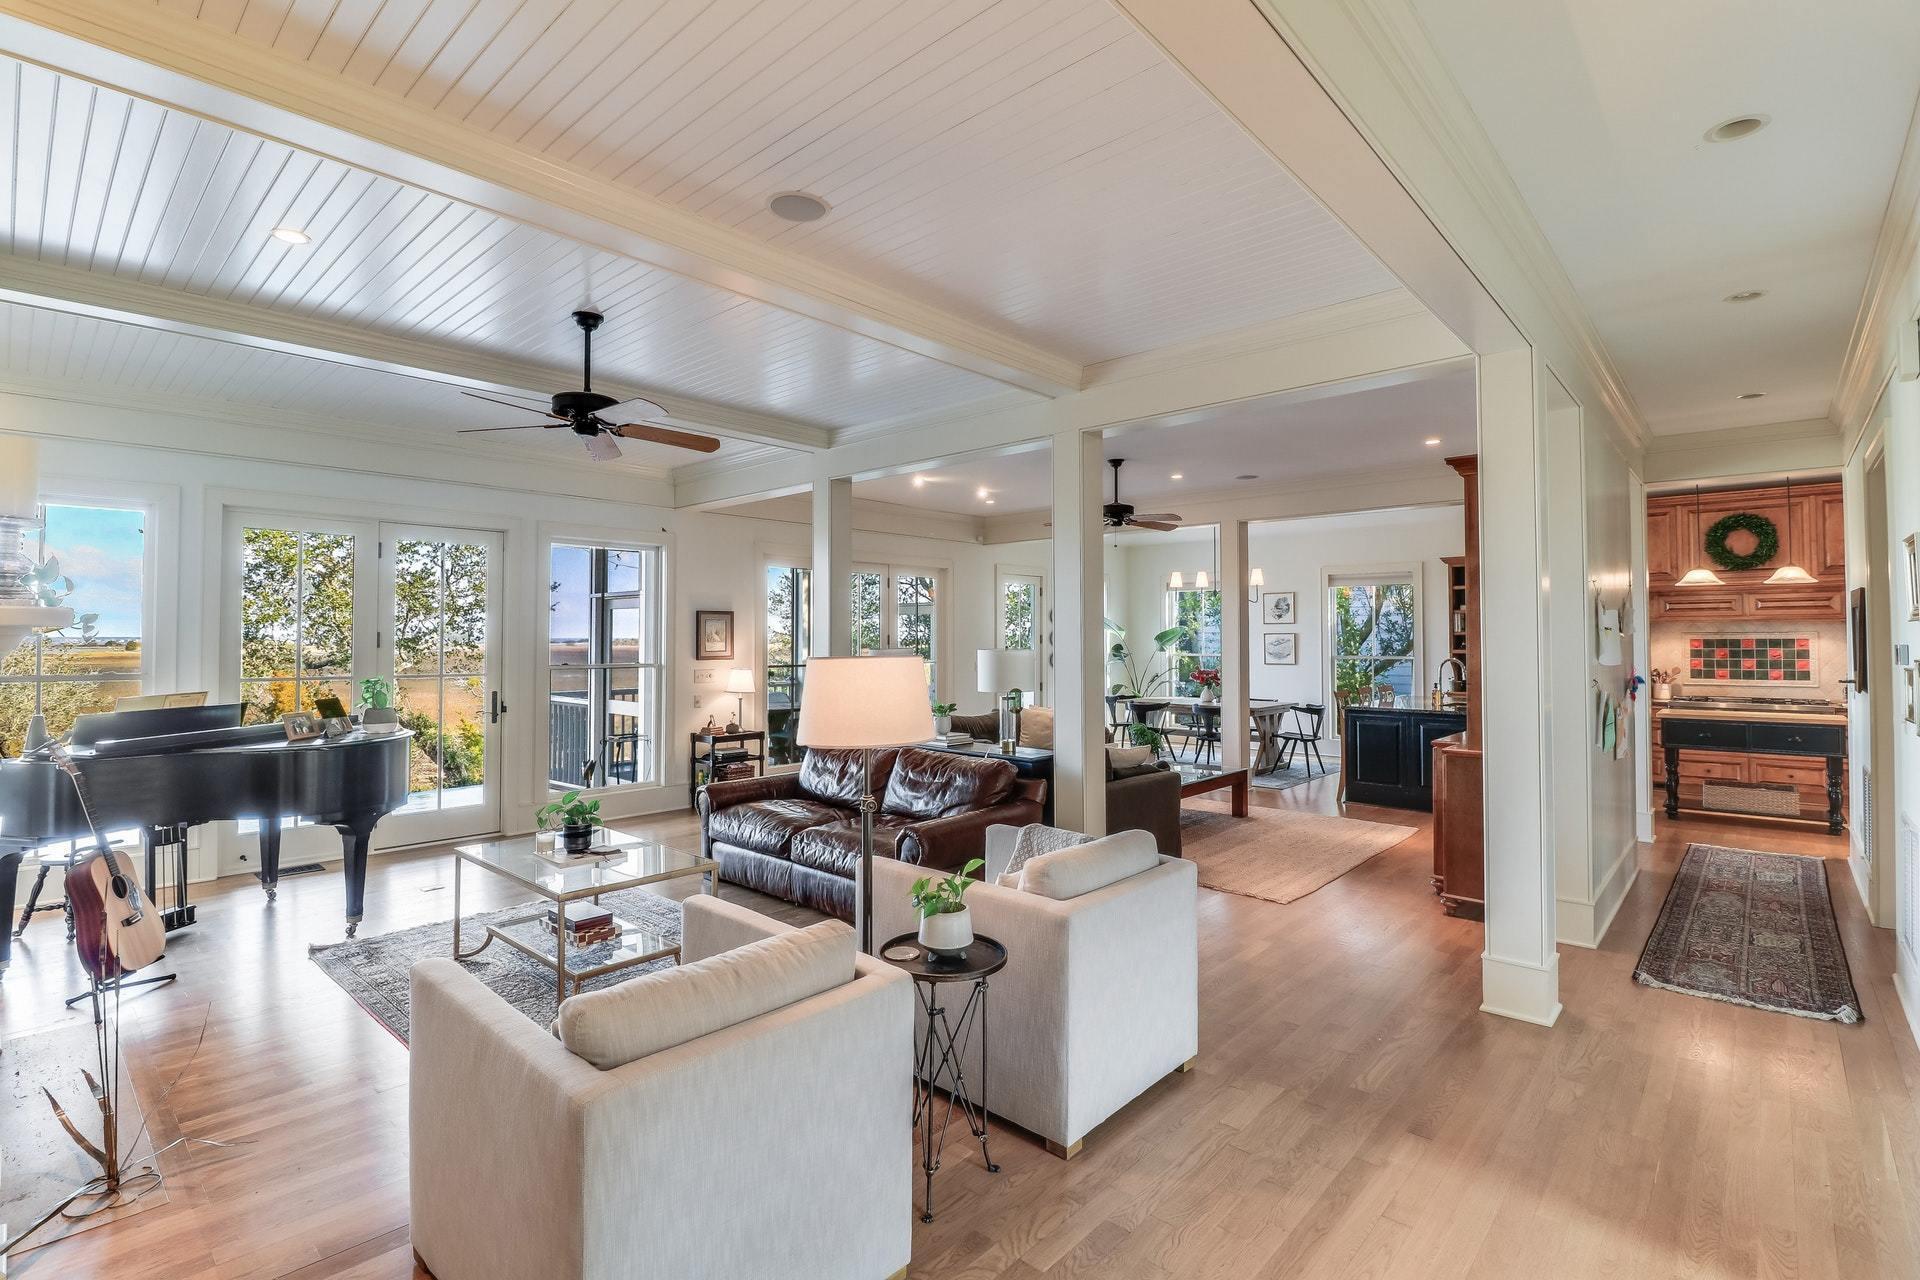 Waterway Island Homes For Sale - 7 Waterway Island Drive, Isle of Palms, SC - 4